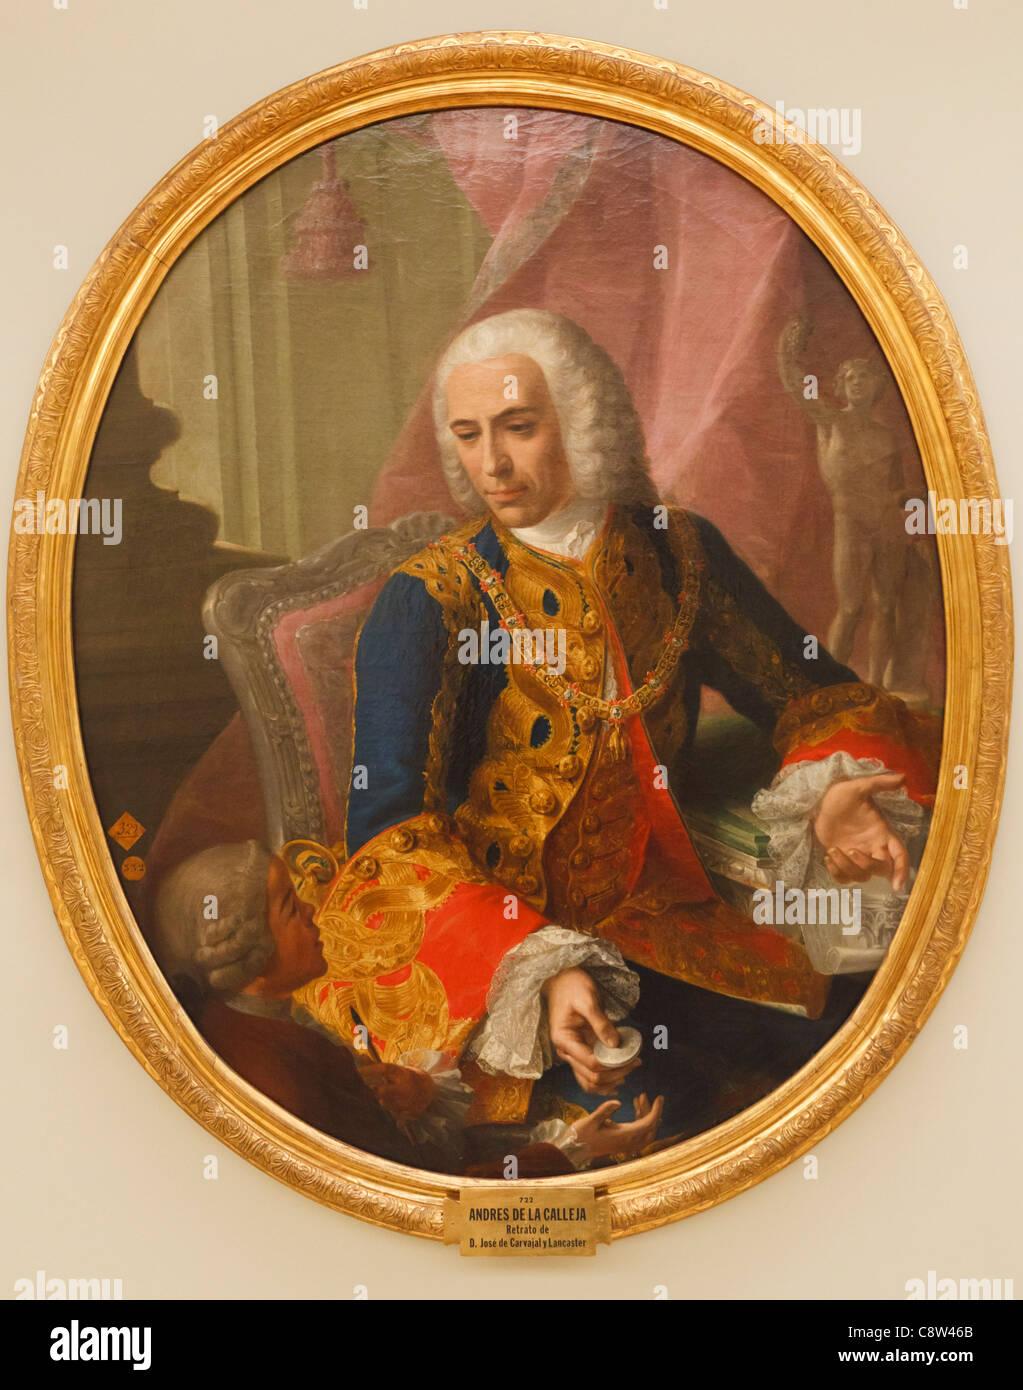 Don Jose de Carvajal y Lancaster, with the boy Mariano Sanchez. Carvajal, 1698 -1754, was a Spanish diplomat. - Stock Image